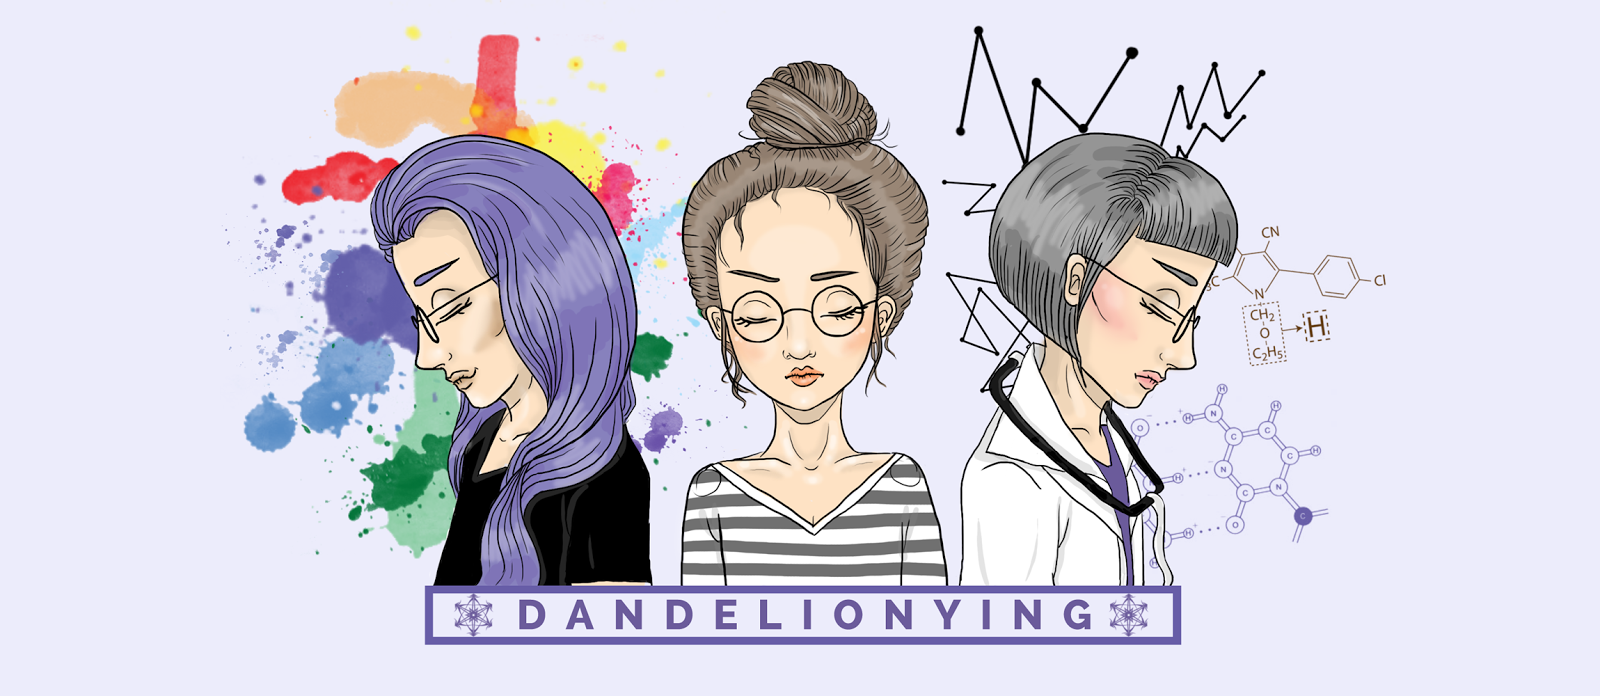 Dandelionying|  蒲公英的约定